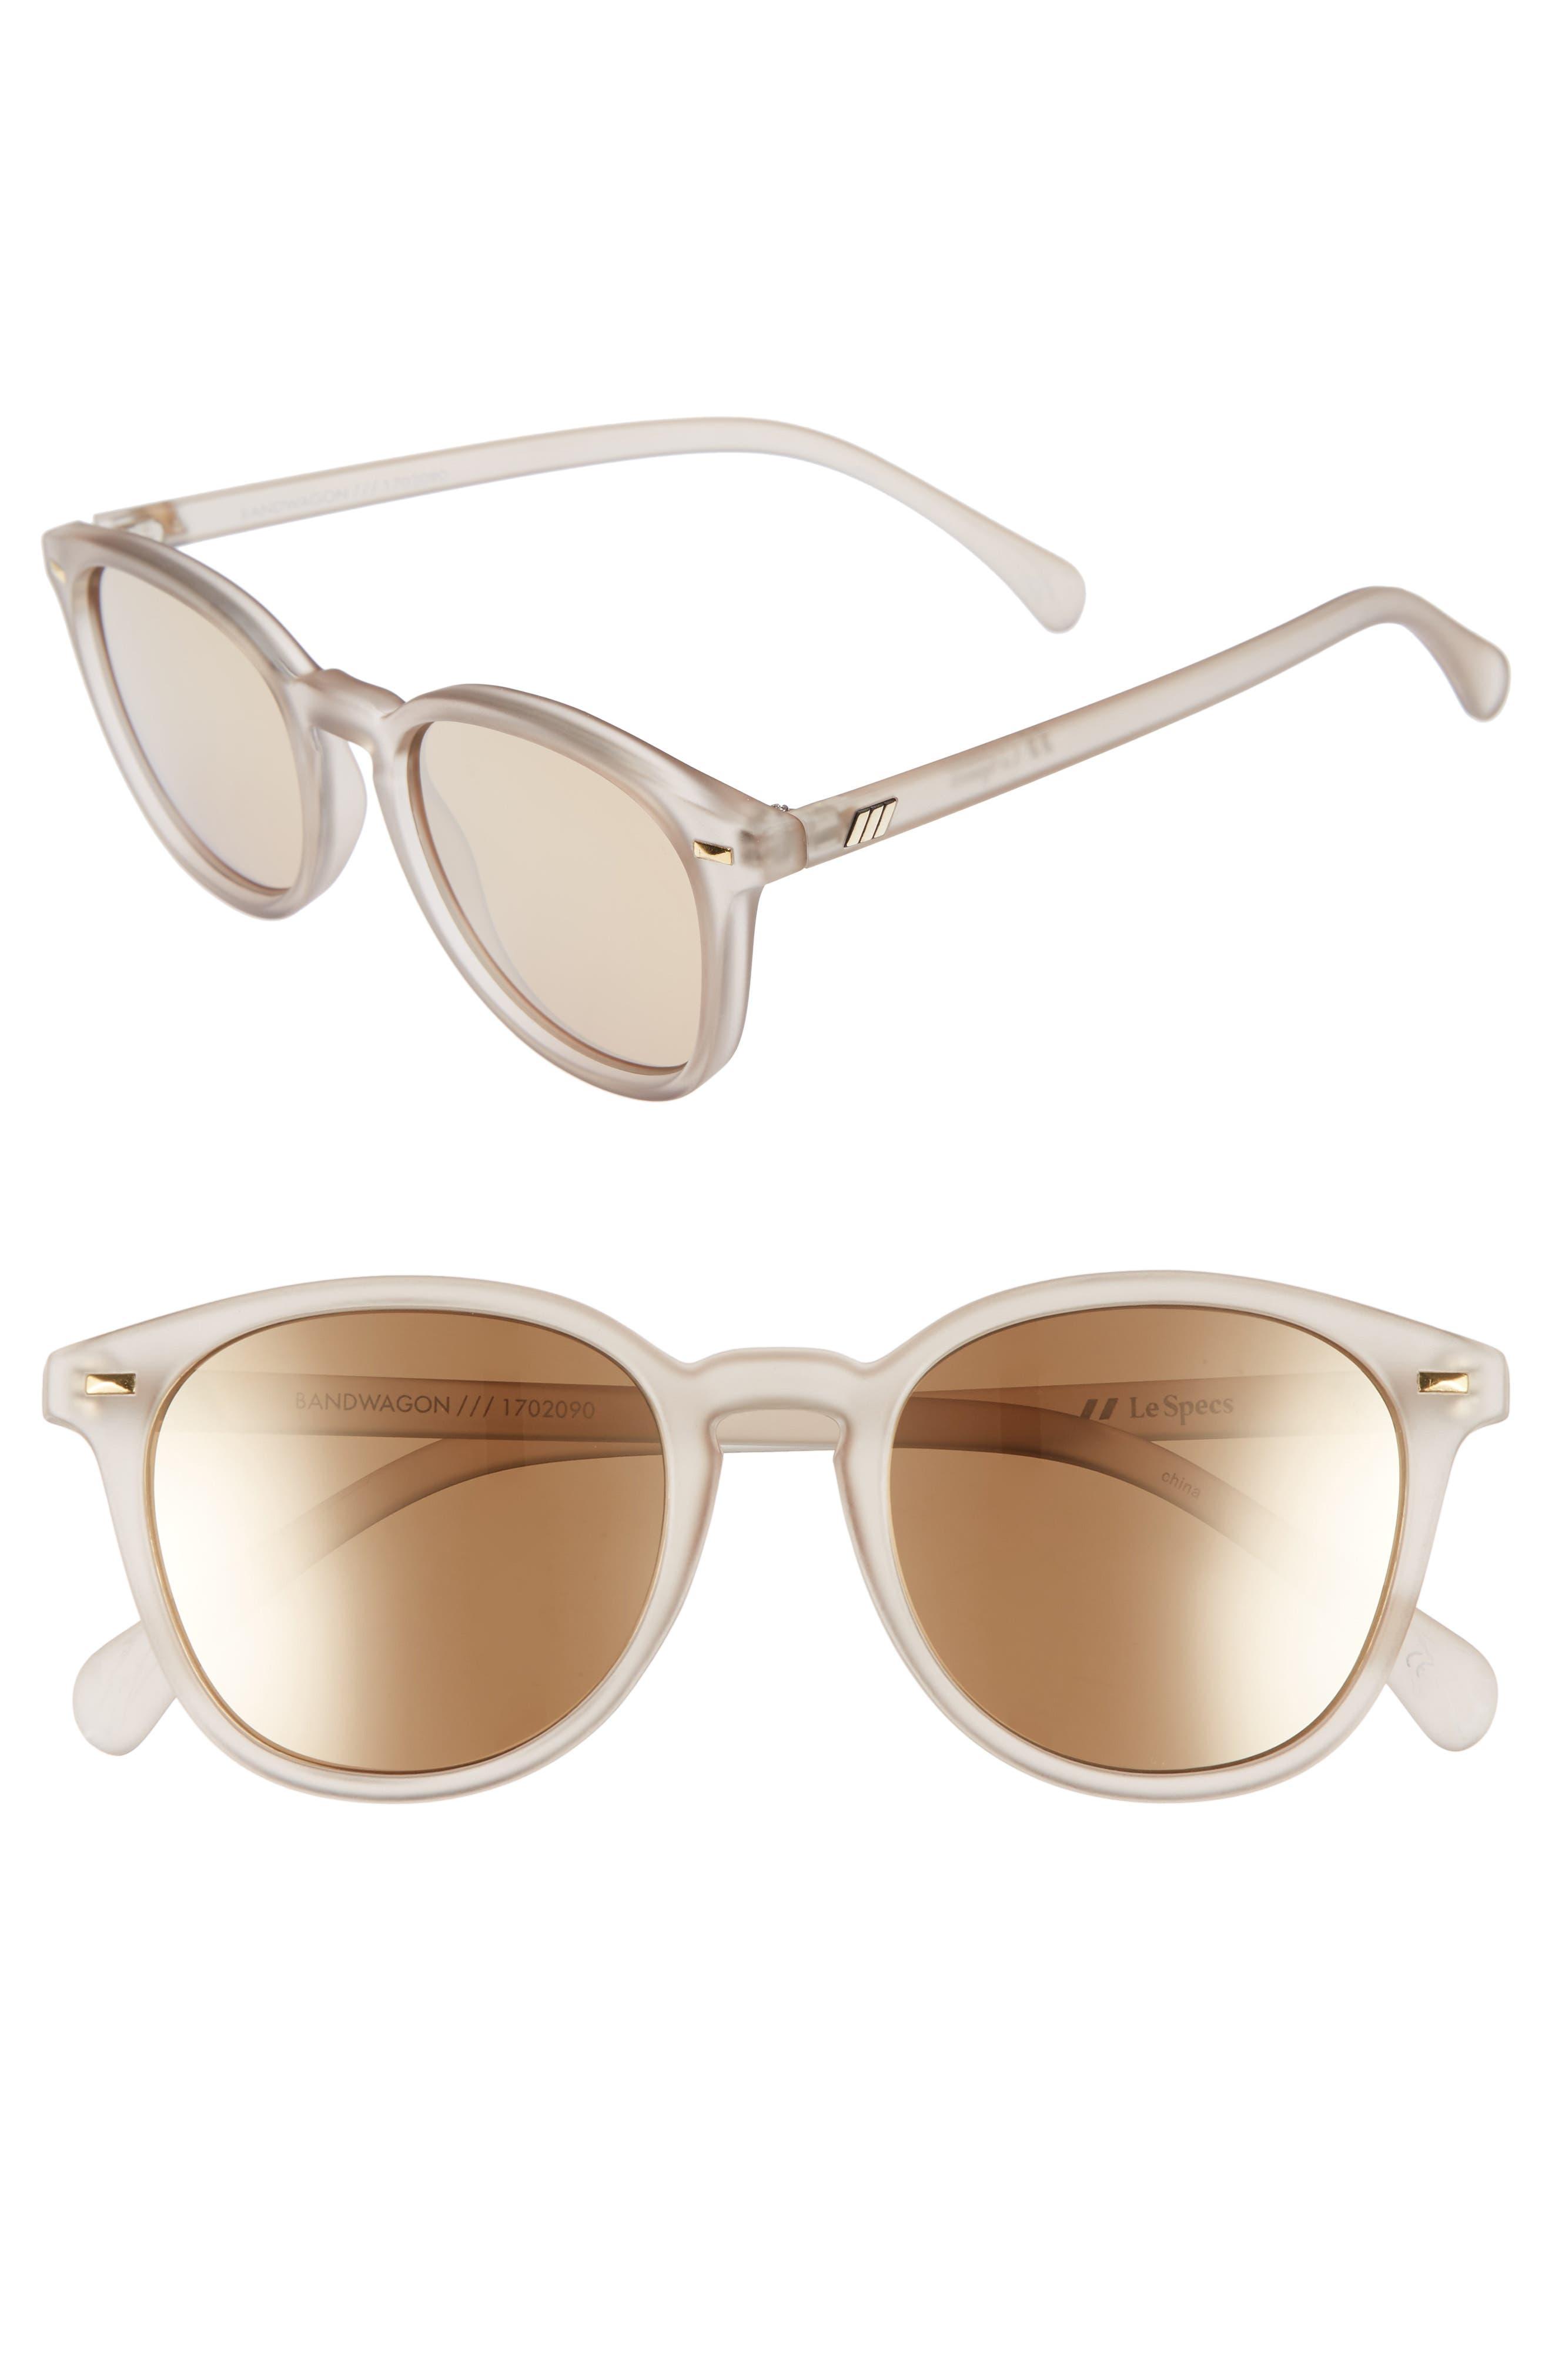 LE SPECS, Bandwagon 51mm Sunglasses, Main thumbnail 1, color, MATTE STONE